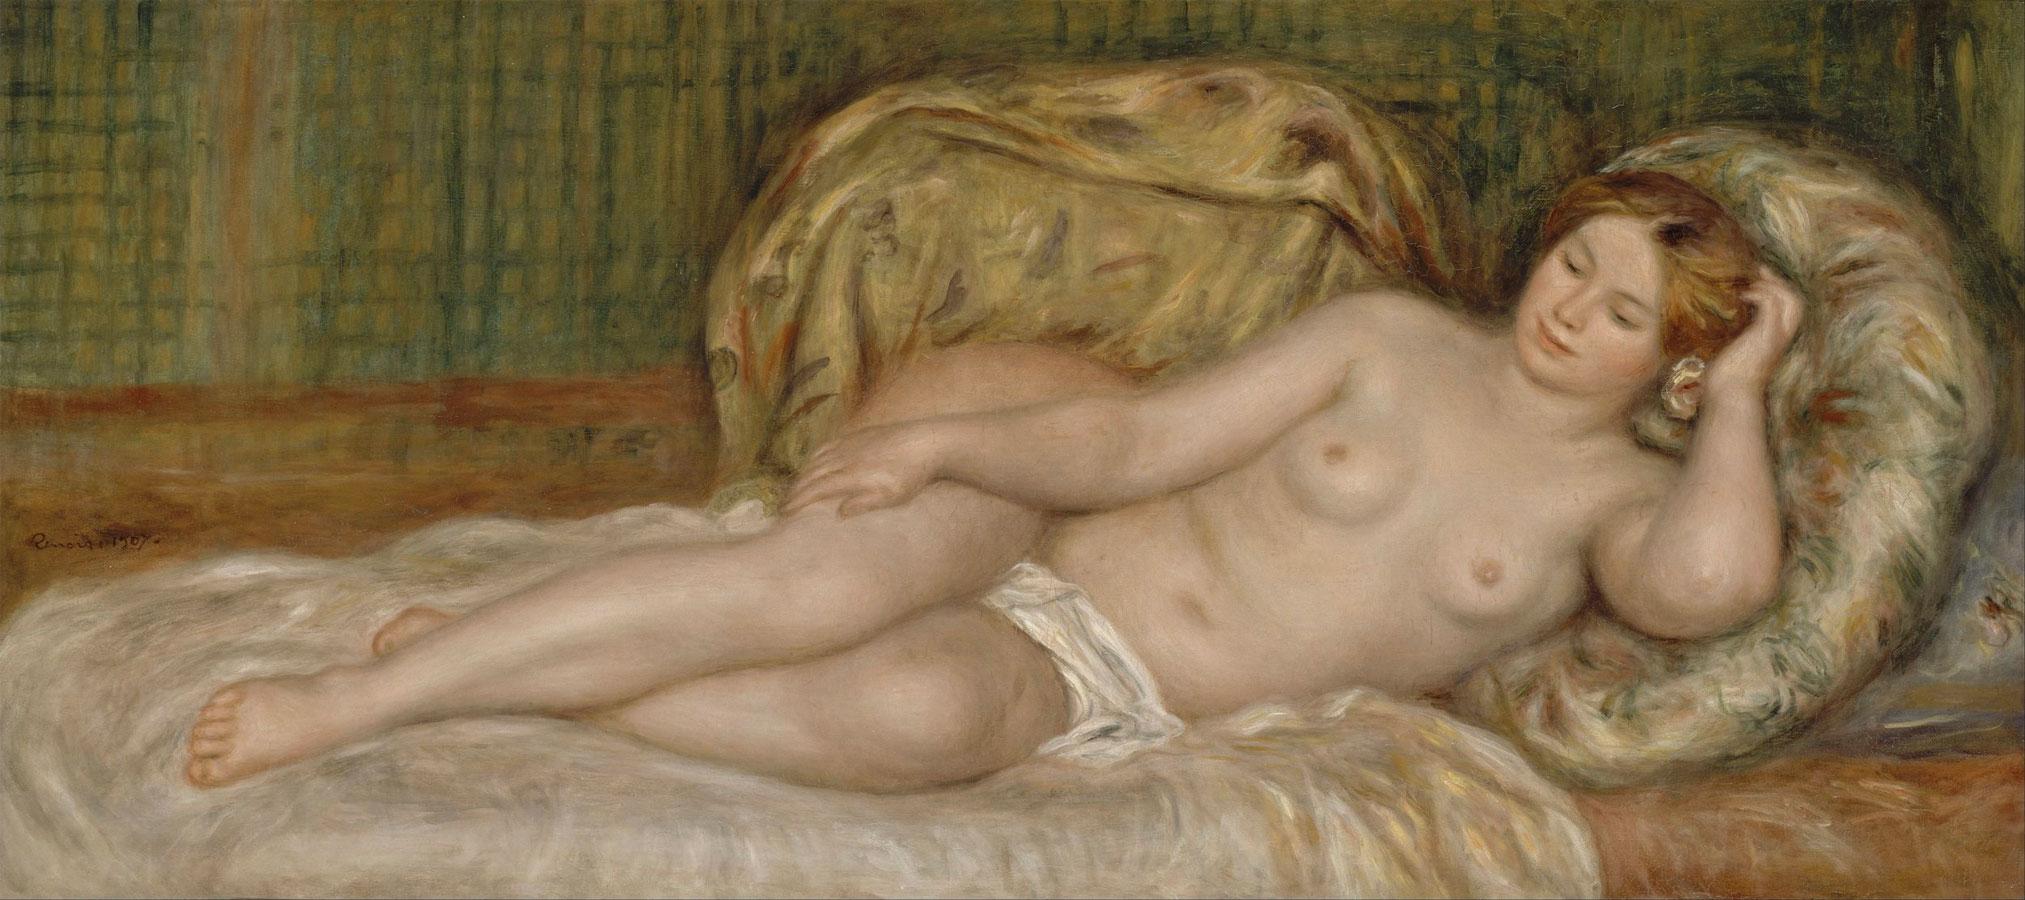 Grande nudo (Grand nu • Renoir, 1907)